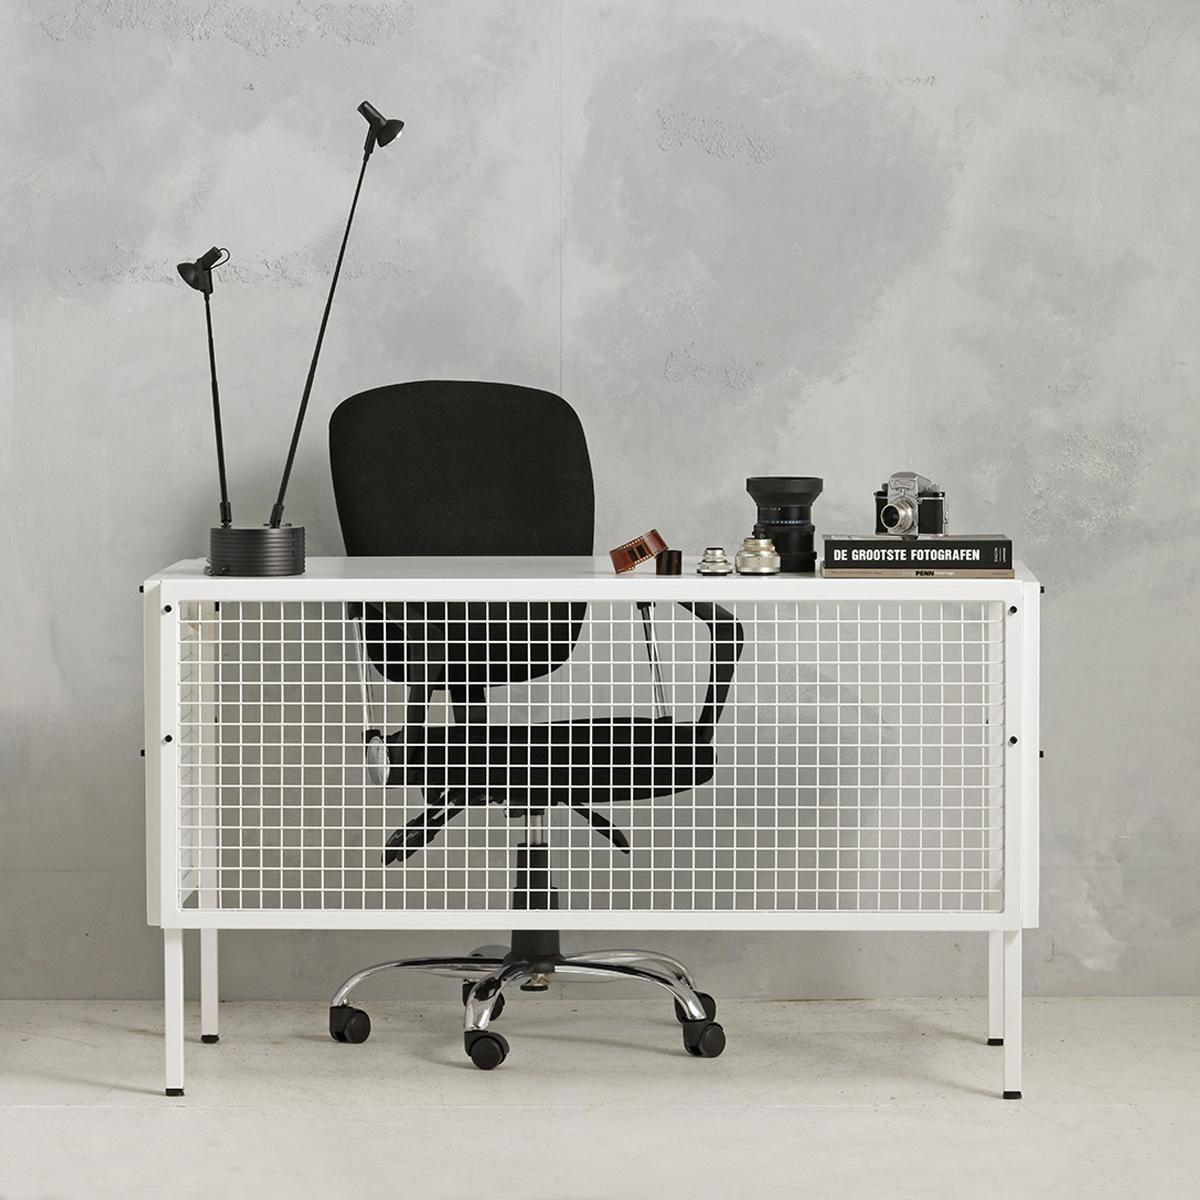 Industrieel metalen bureau - wit - 75.2x130.7x62 cm - LCS-111